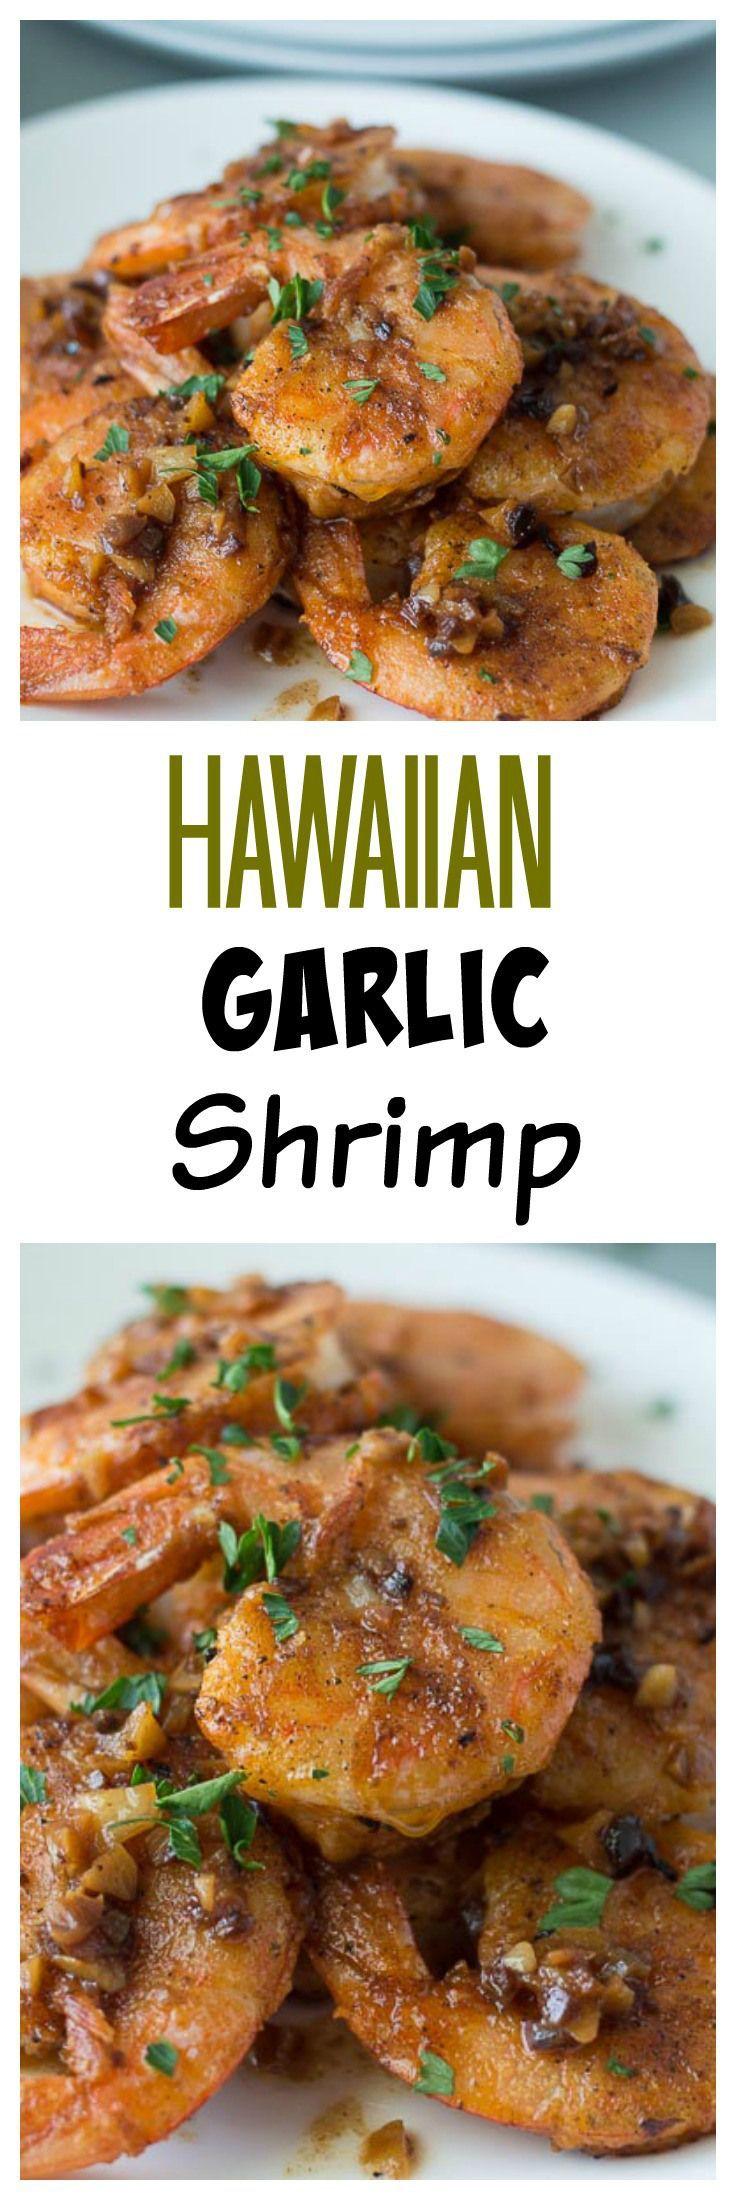 Hawaiian Garlic Shrimp Recipe.  This recipe is similar to the Hawaii Shrimp Truck Garlic Shrimp Plates you can get in Paradise!